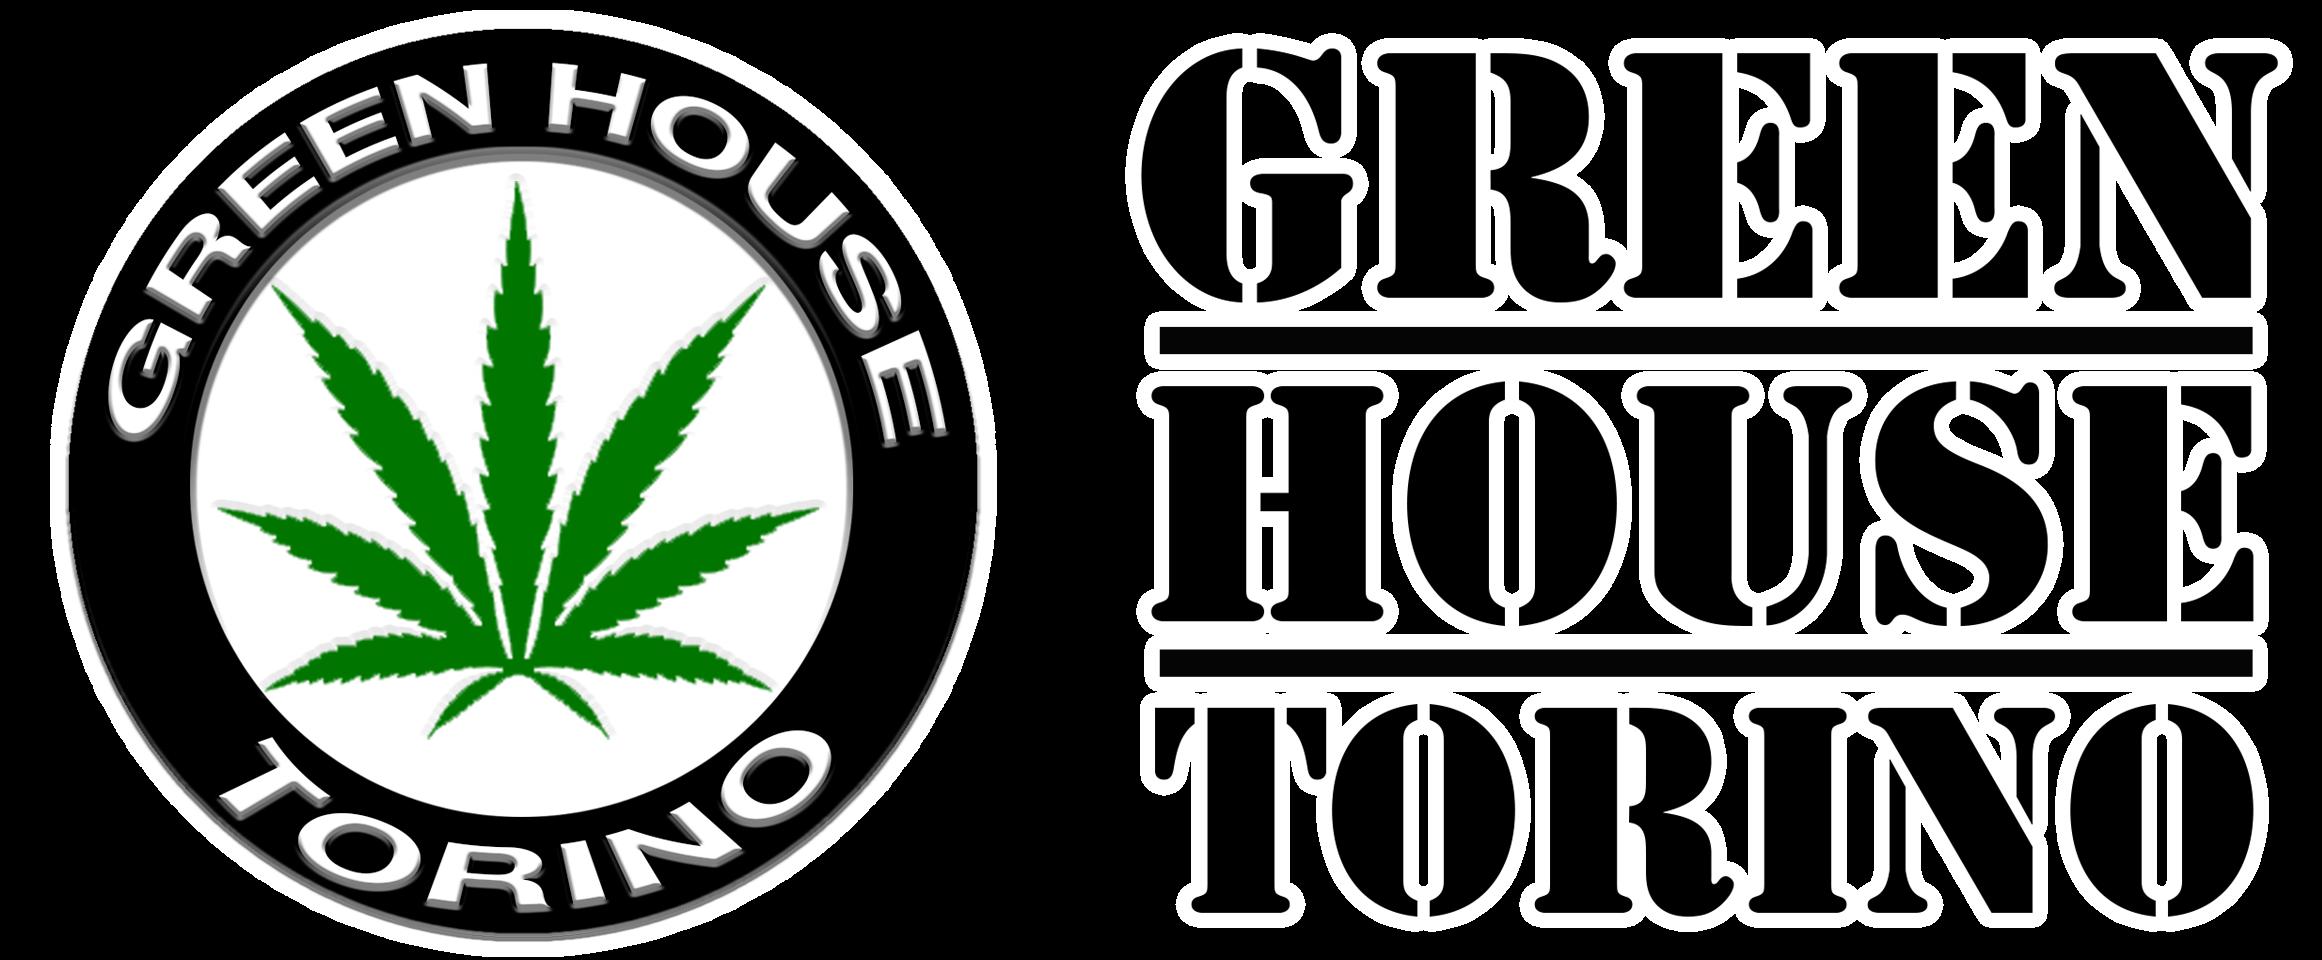 Green House Torino